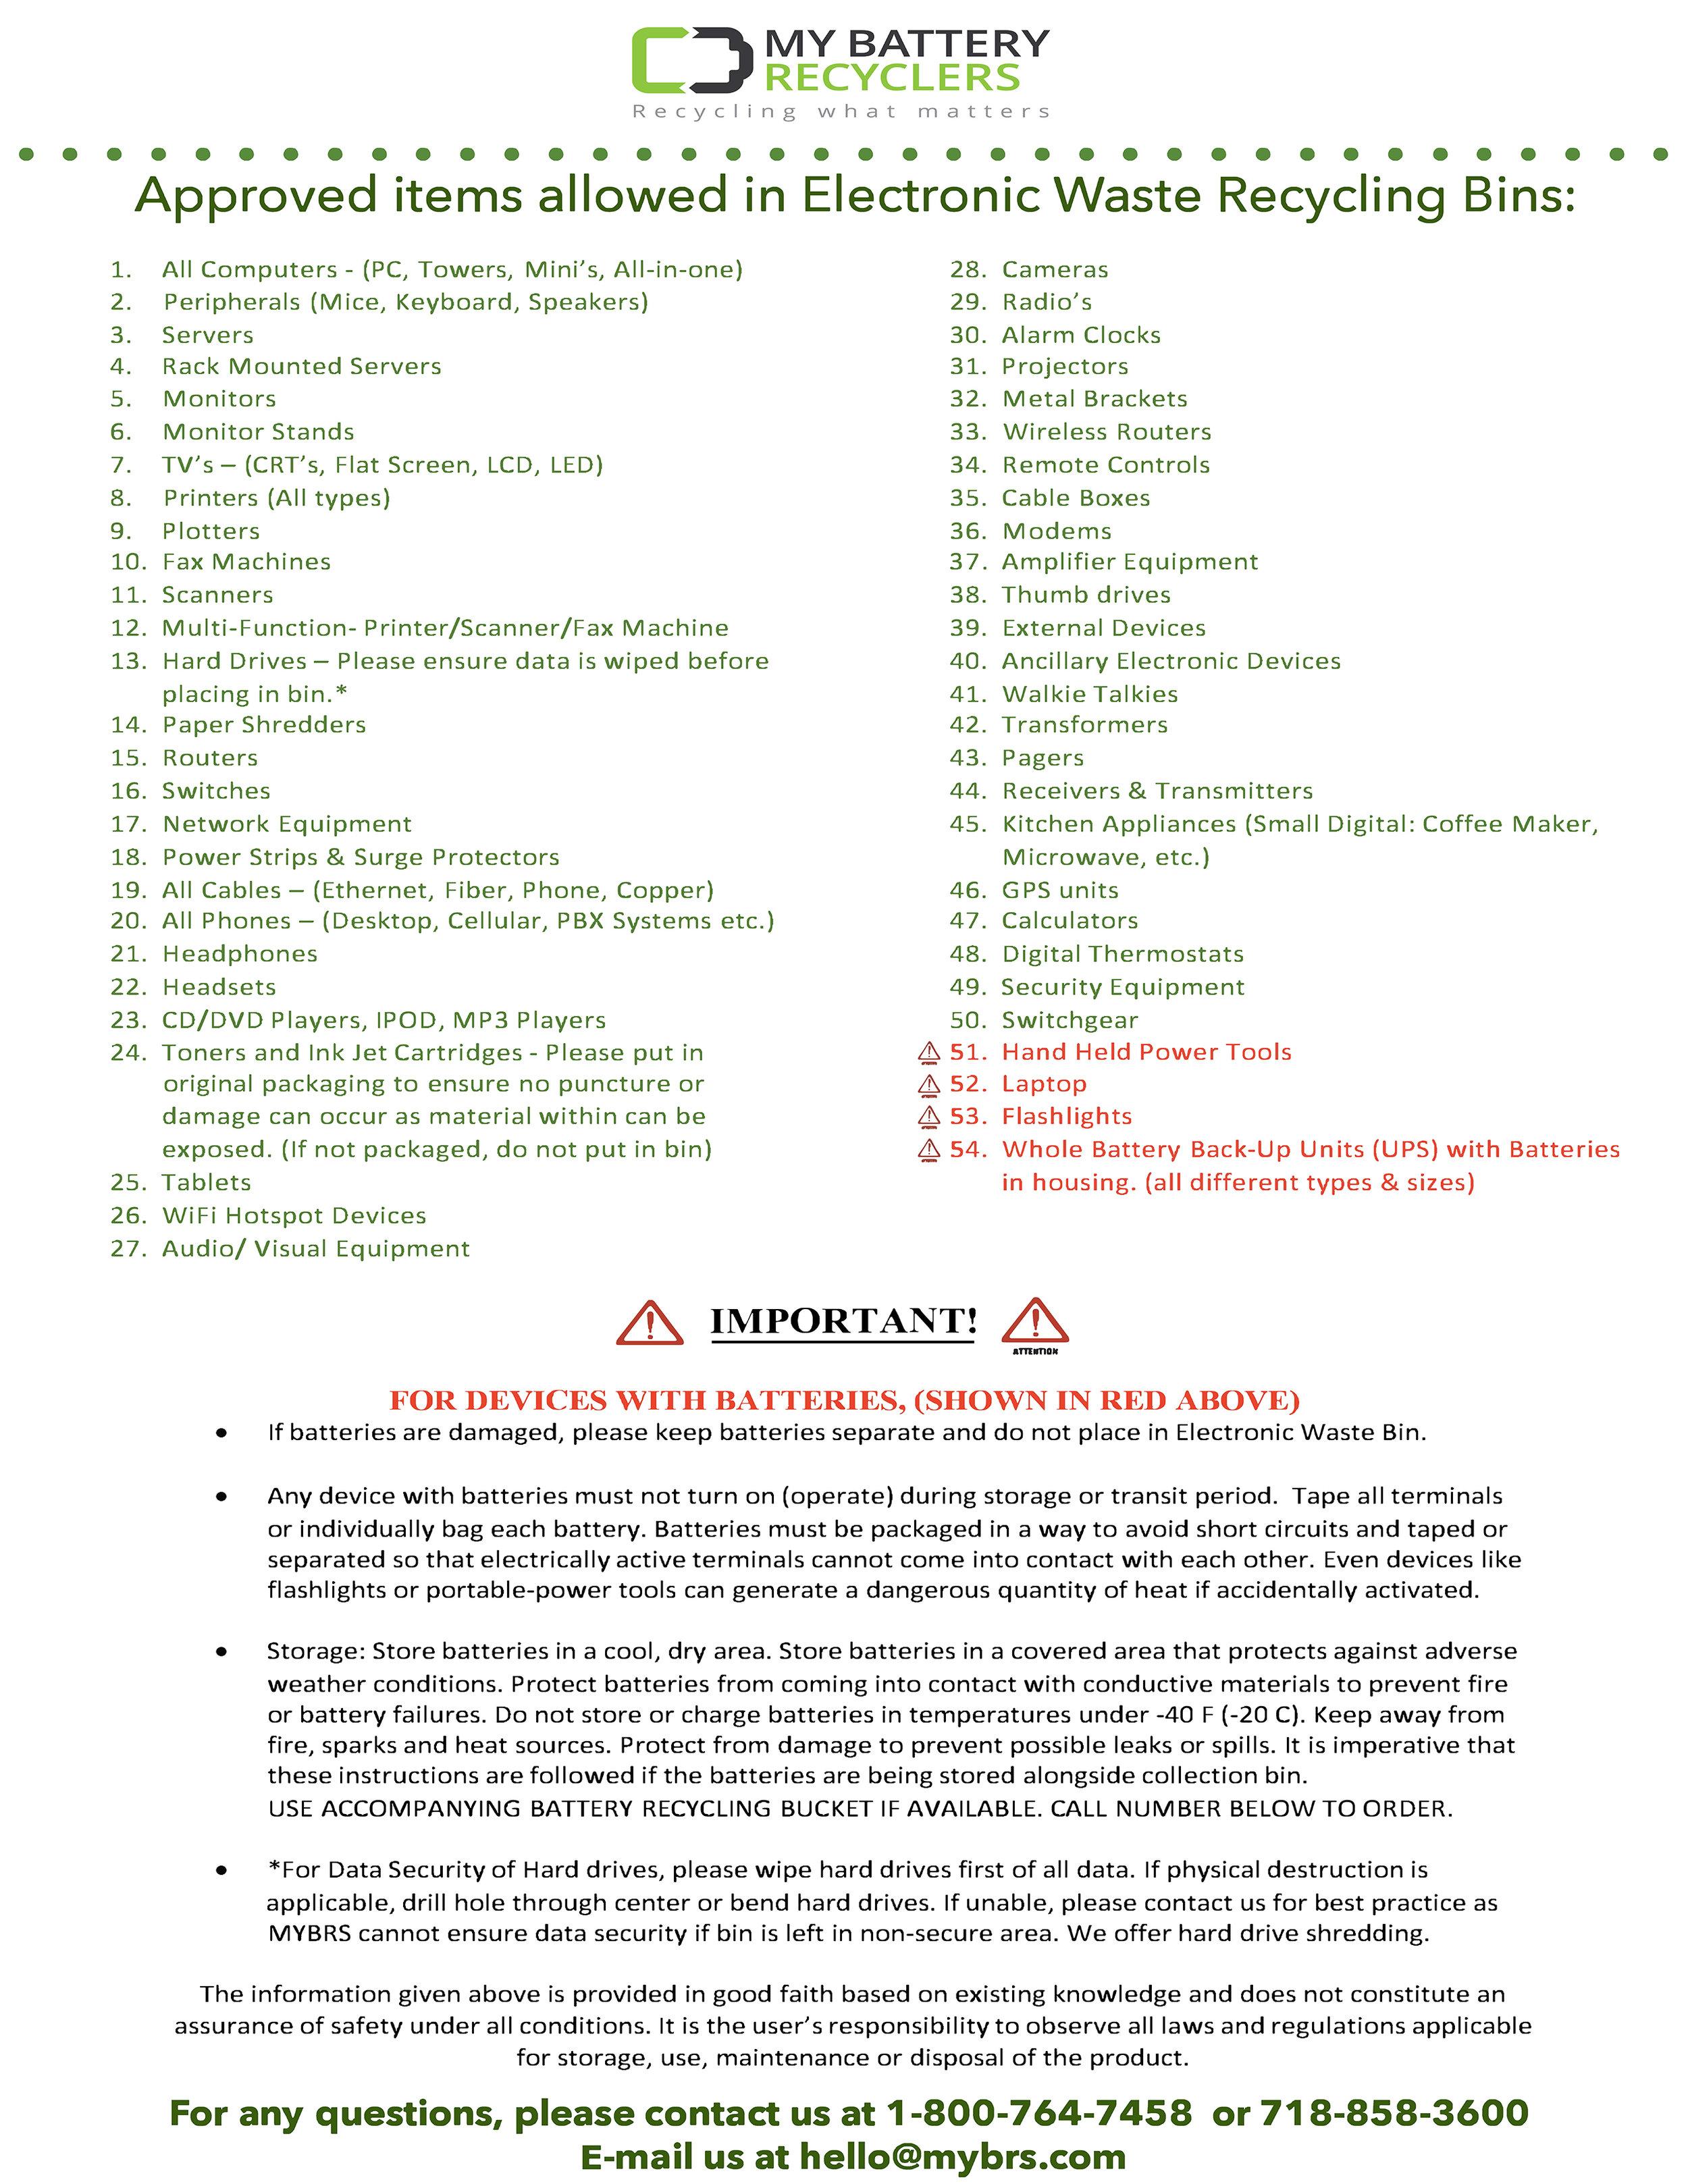 accepted list.jpg